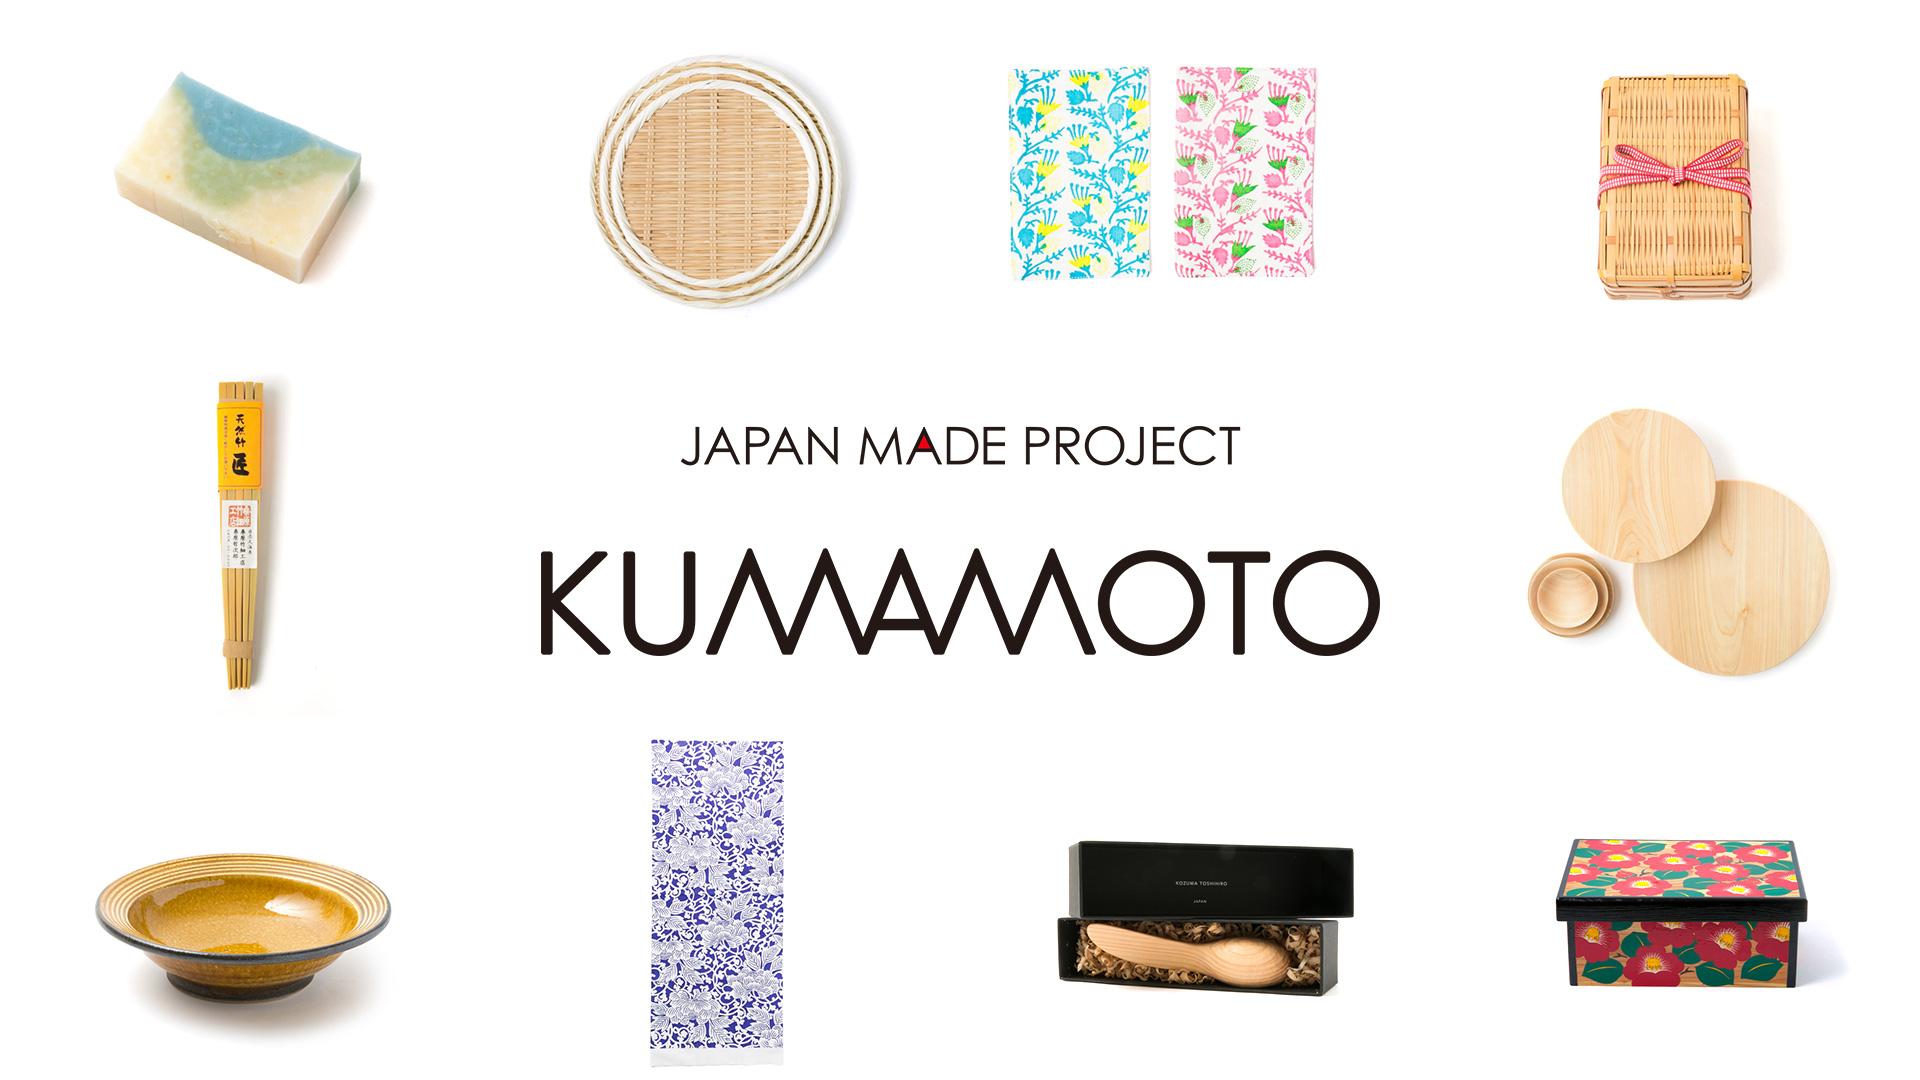 JAPAN MADE PROJECT KUMAMOTO